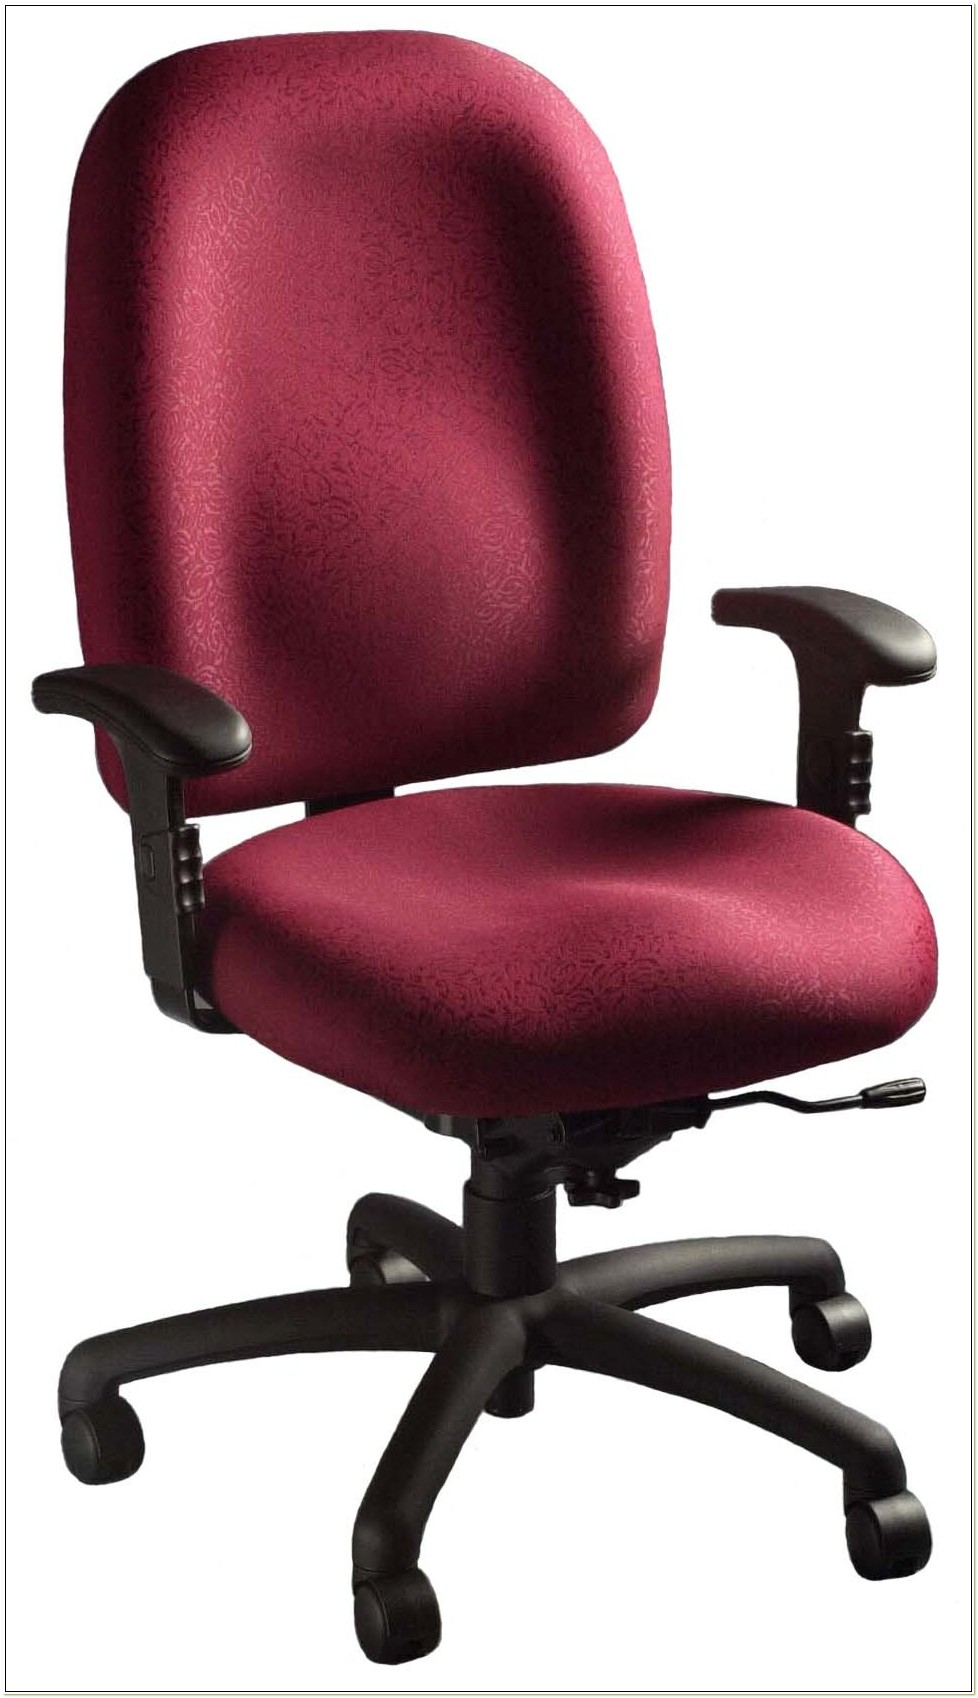 Cheap Ergonomic Office Chairs